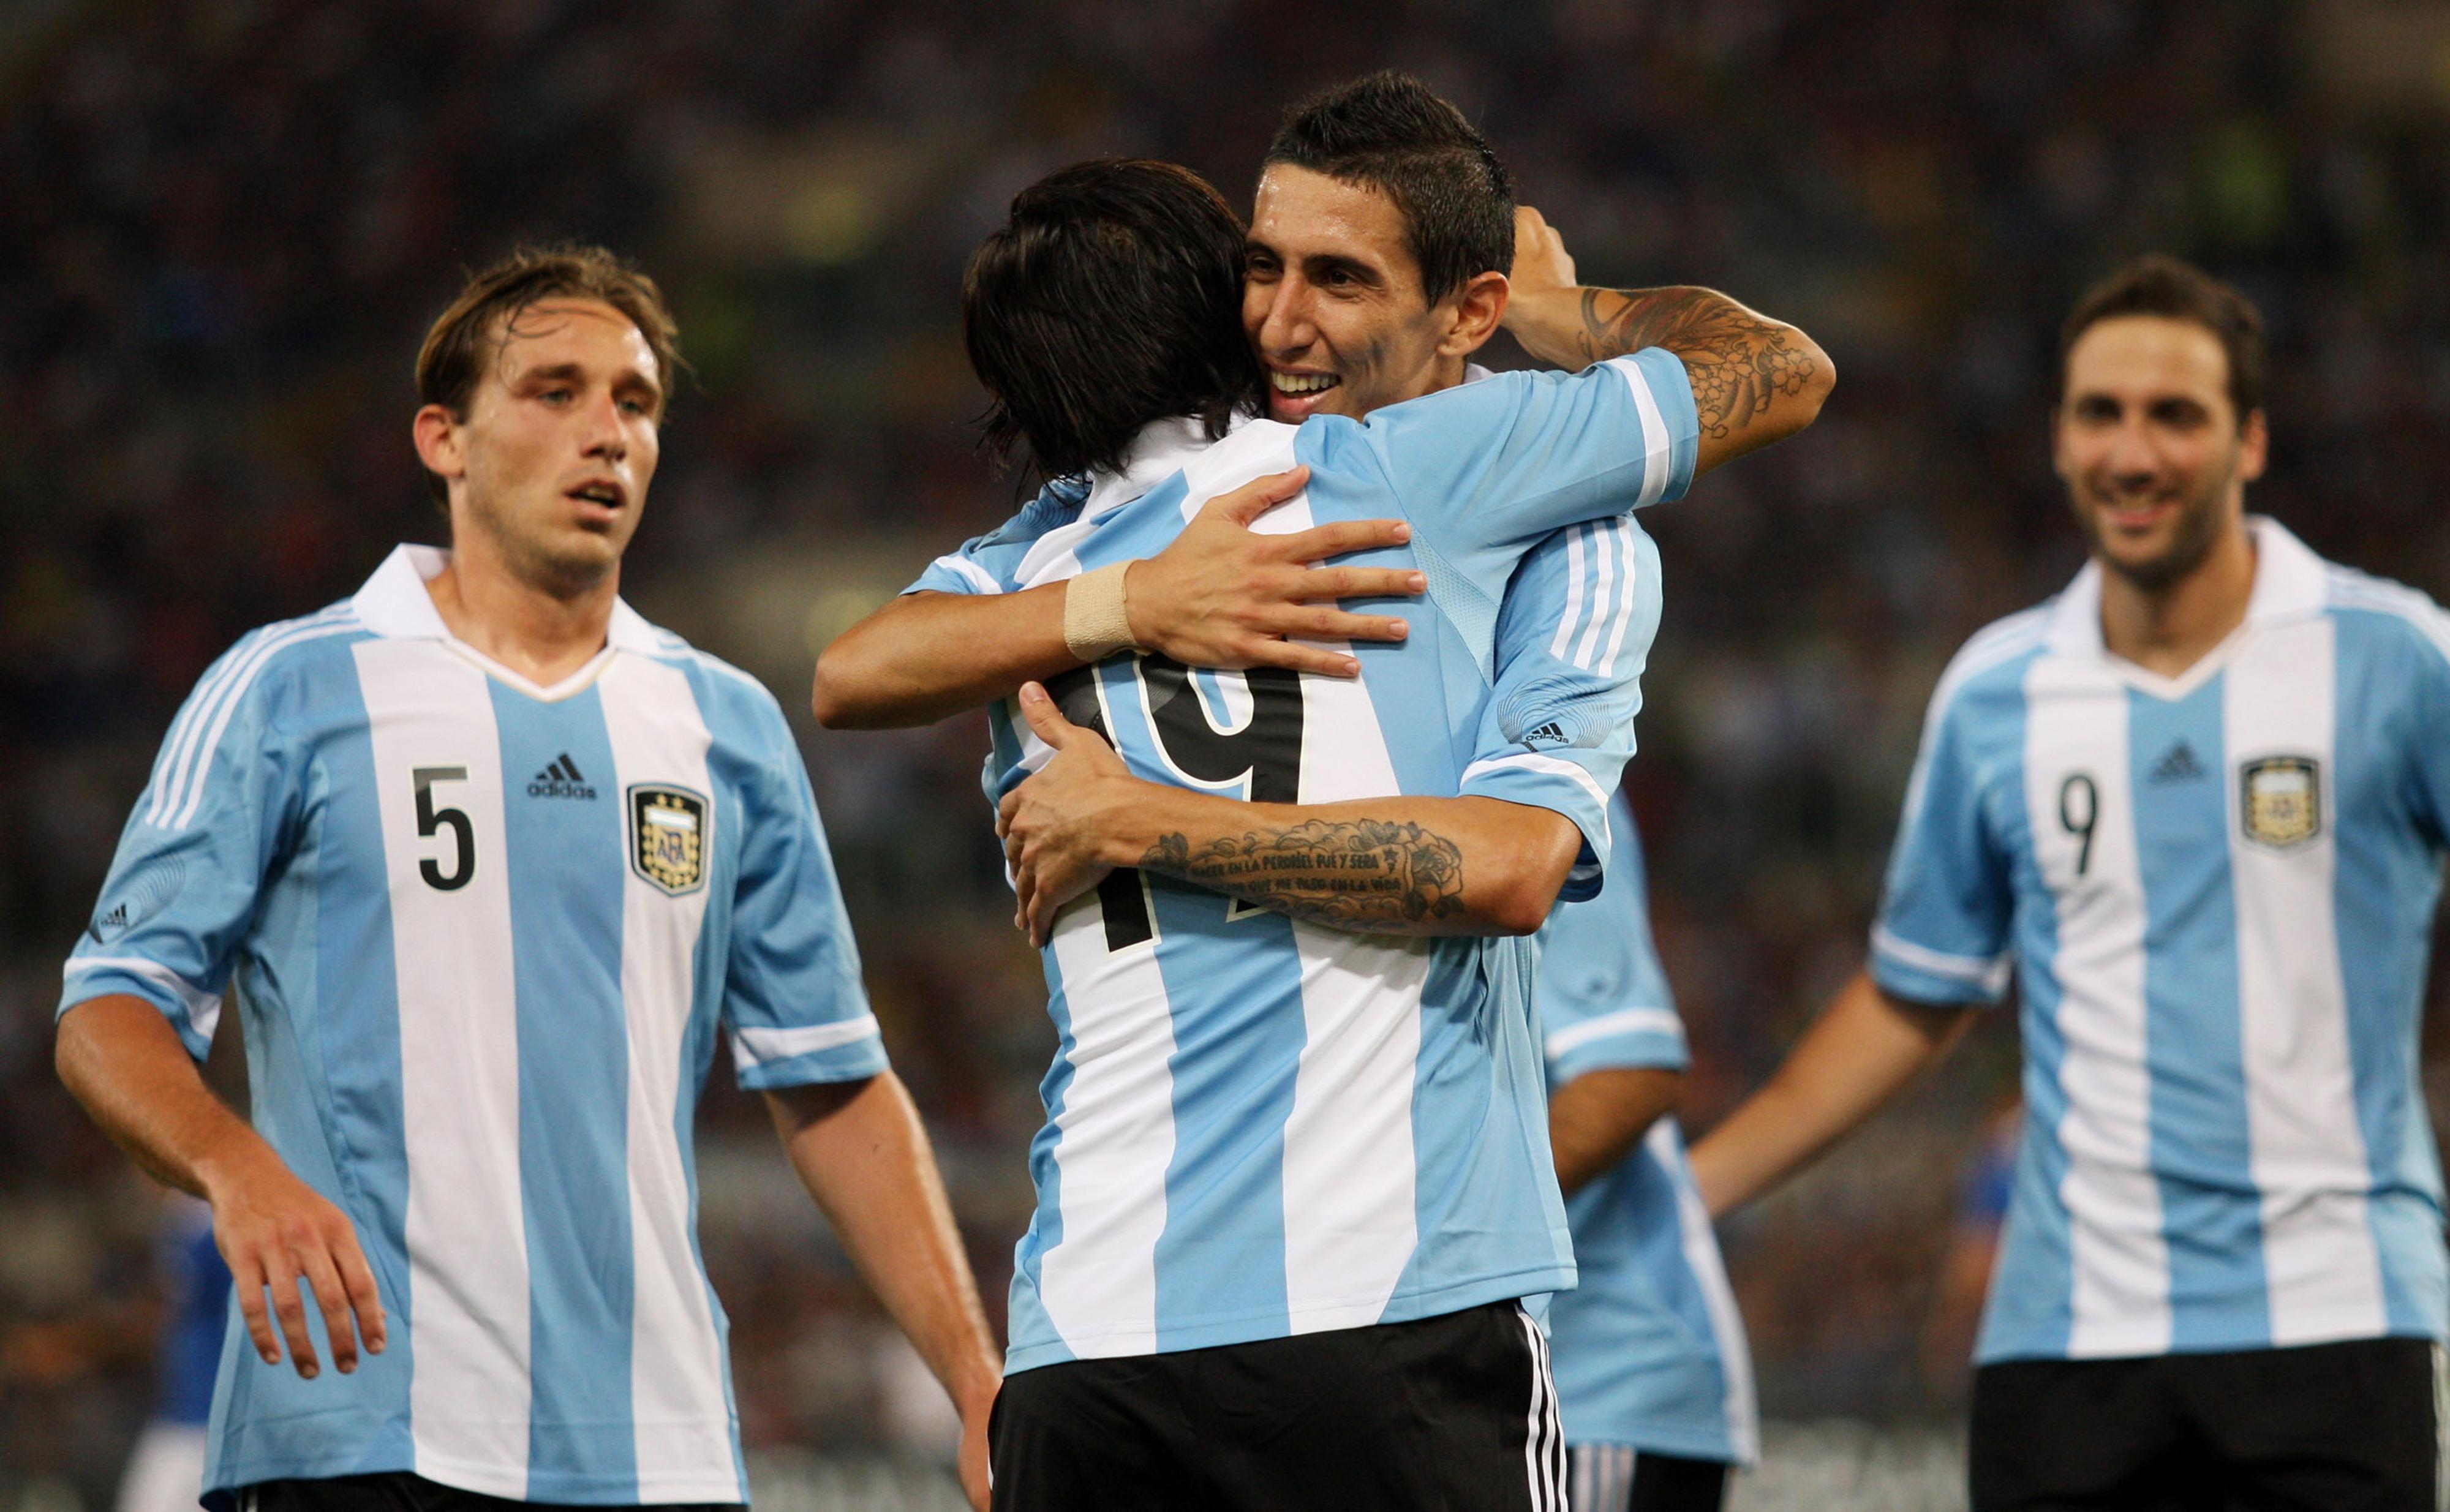 Argentina vs. Peru: Final score 3-1, Ezequiel Lavezzi leads La Albiceleste to victory